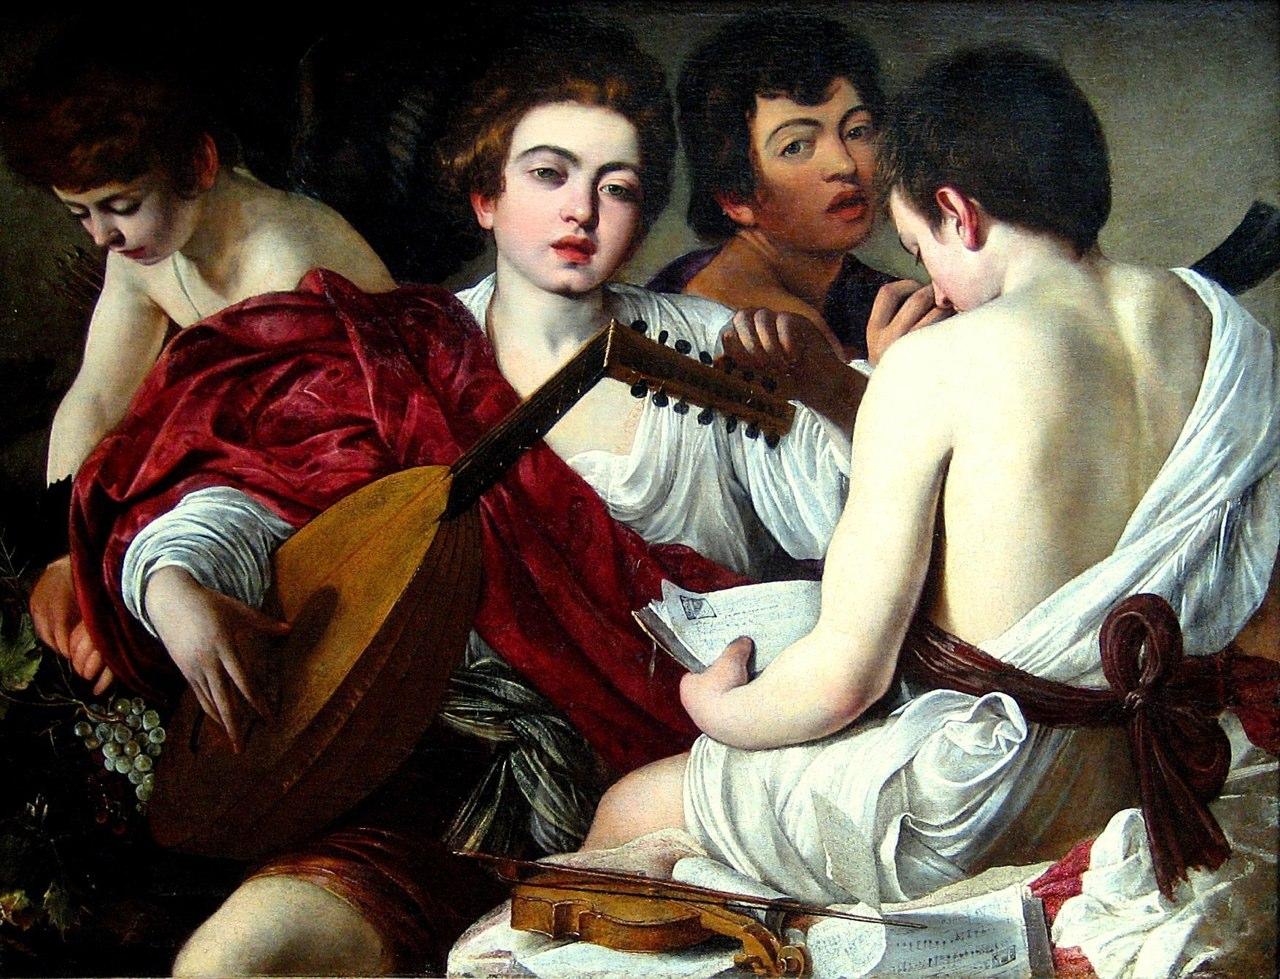 The Concert (ca 1595), Michelangelo Merisi da Caravaggio (1571-1609/1610). New York: Metropolitan Museum of Art, 52.81